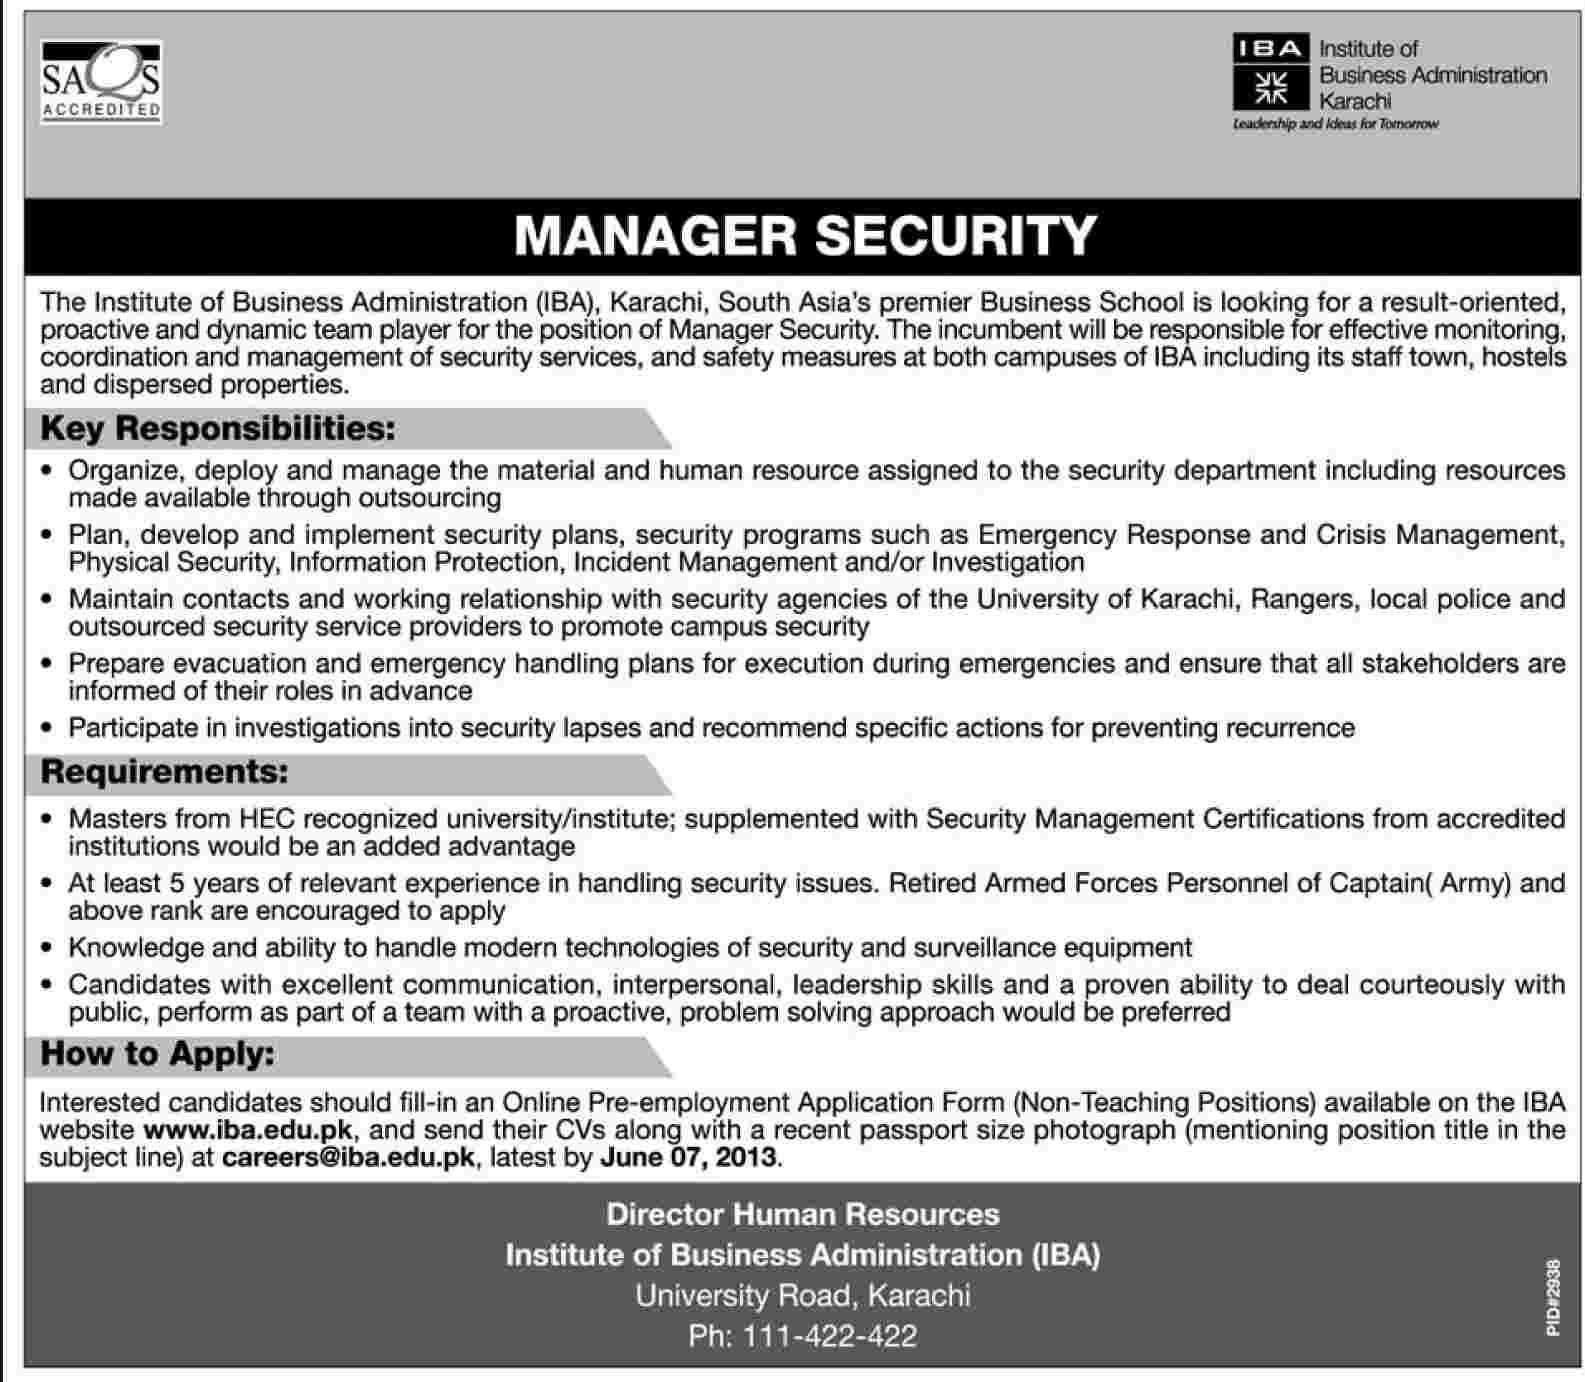 IBA Karachi Manager Security Job - Jobs in Pakistan ,Dawn